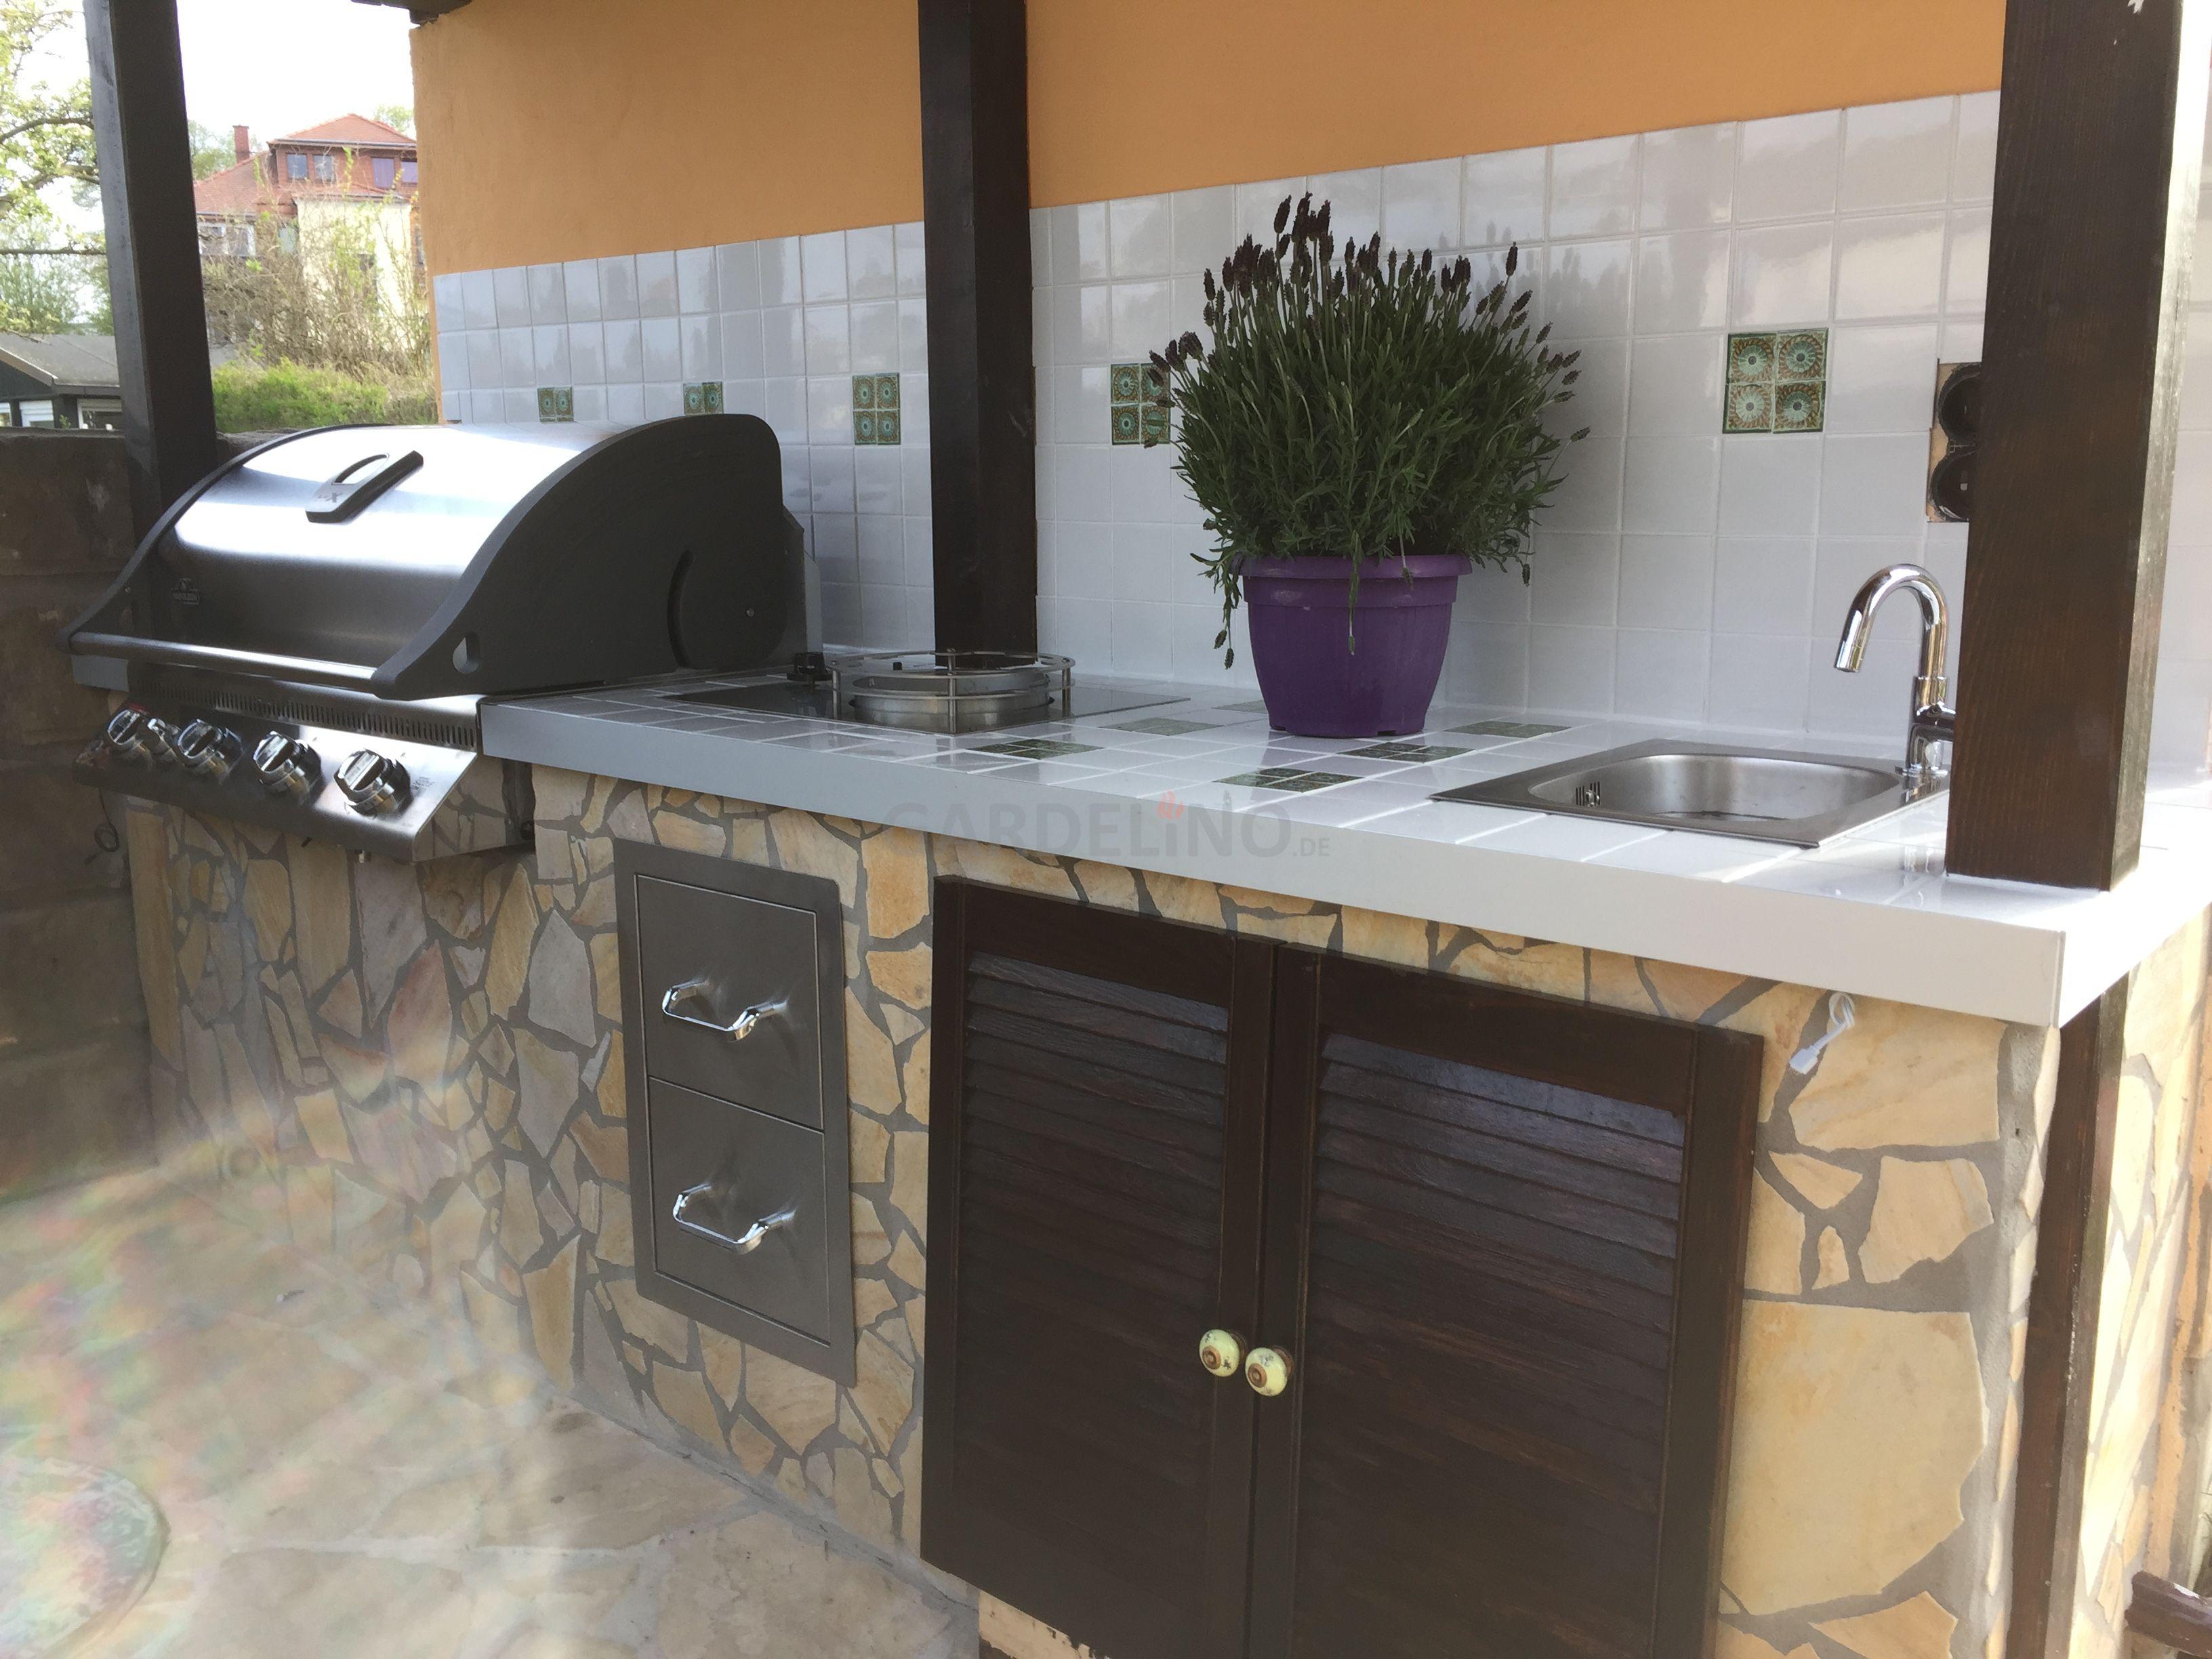 Gasgrill Outdoor Küche : Gasgrill in outdoor küche integrieren outdoor küche mit gasgrill